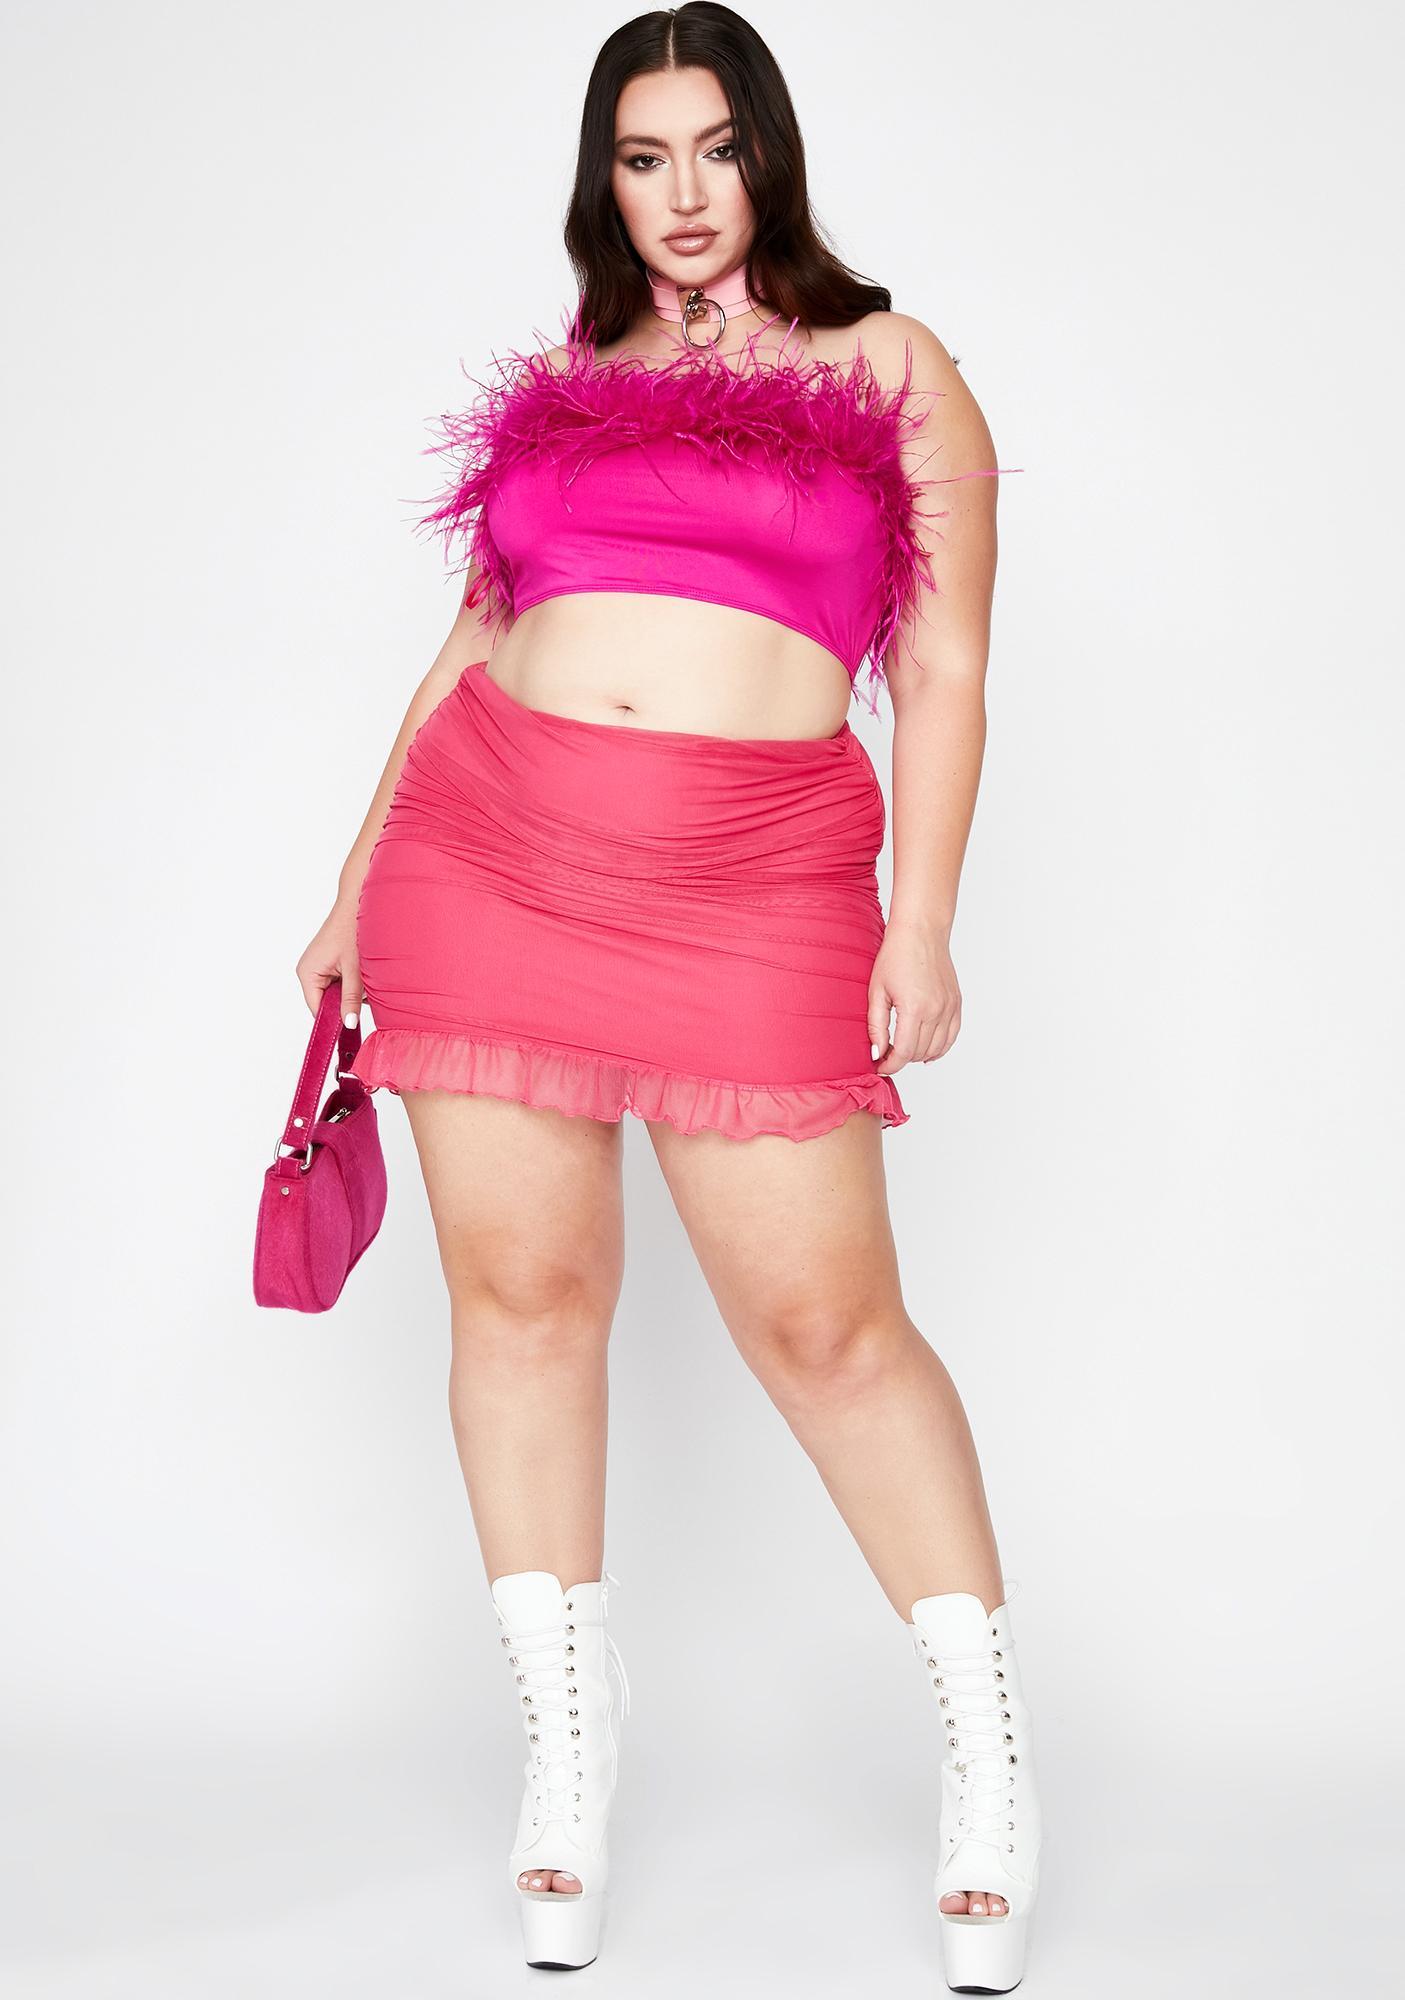 Pretty Lil Prissy Much Marabou Top